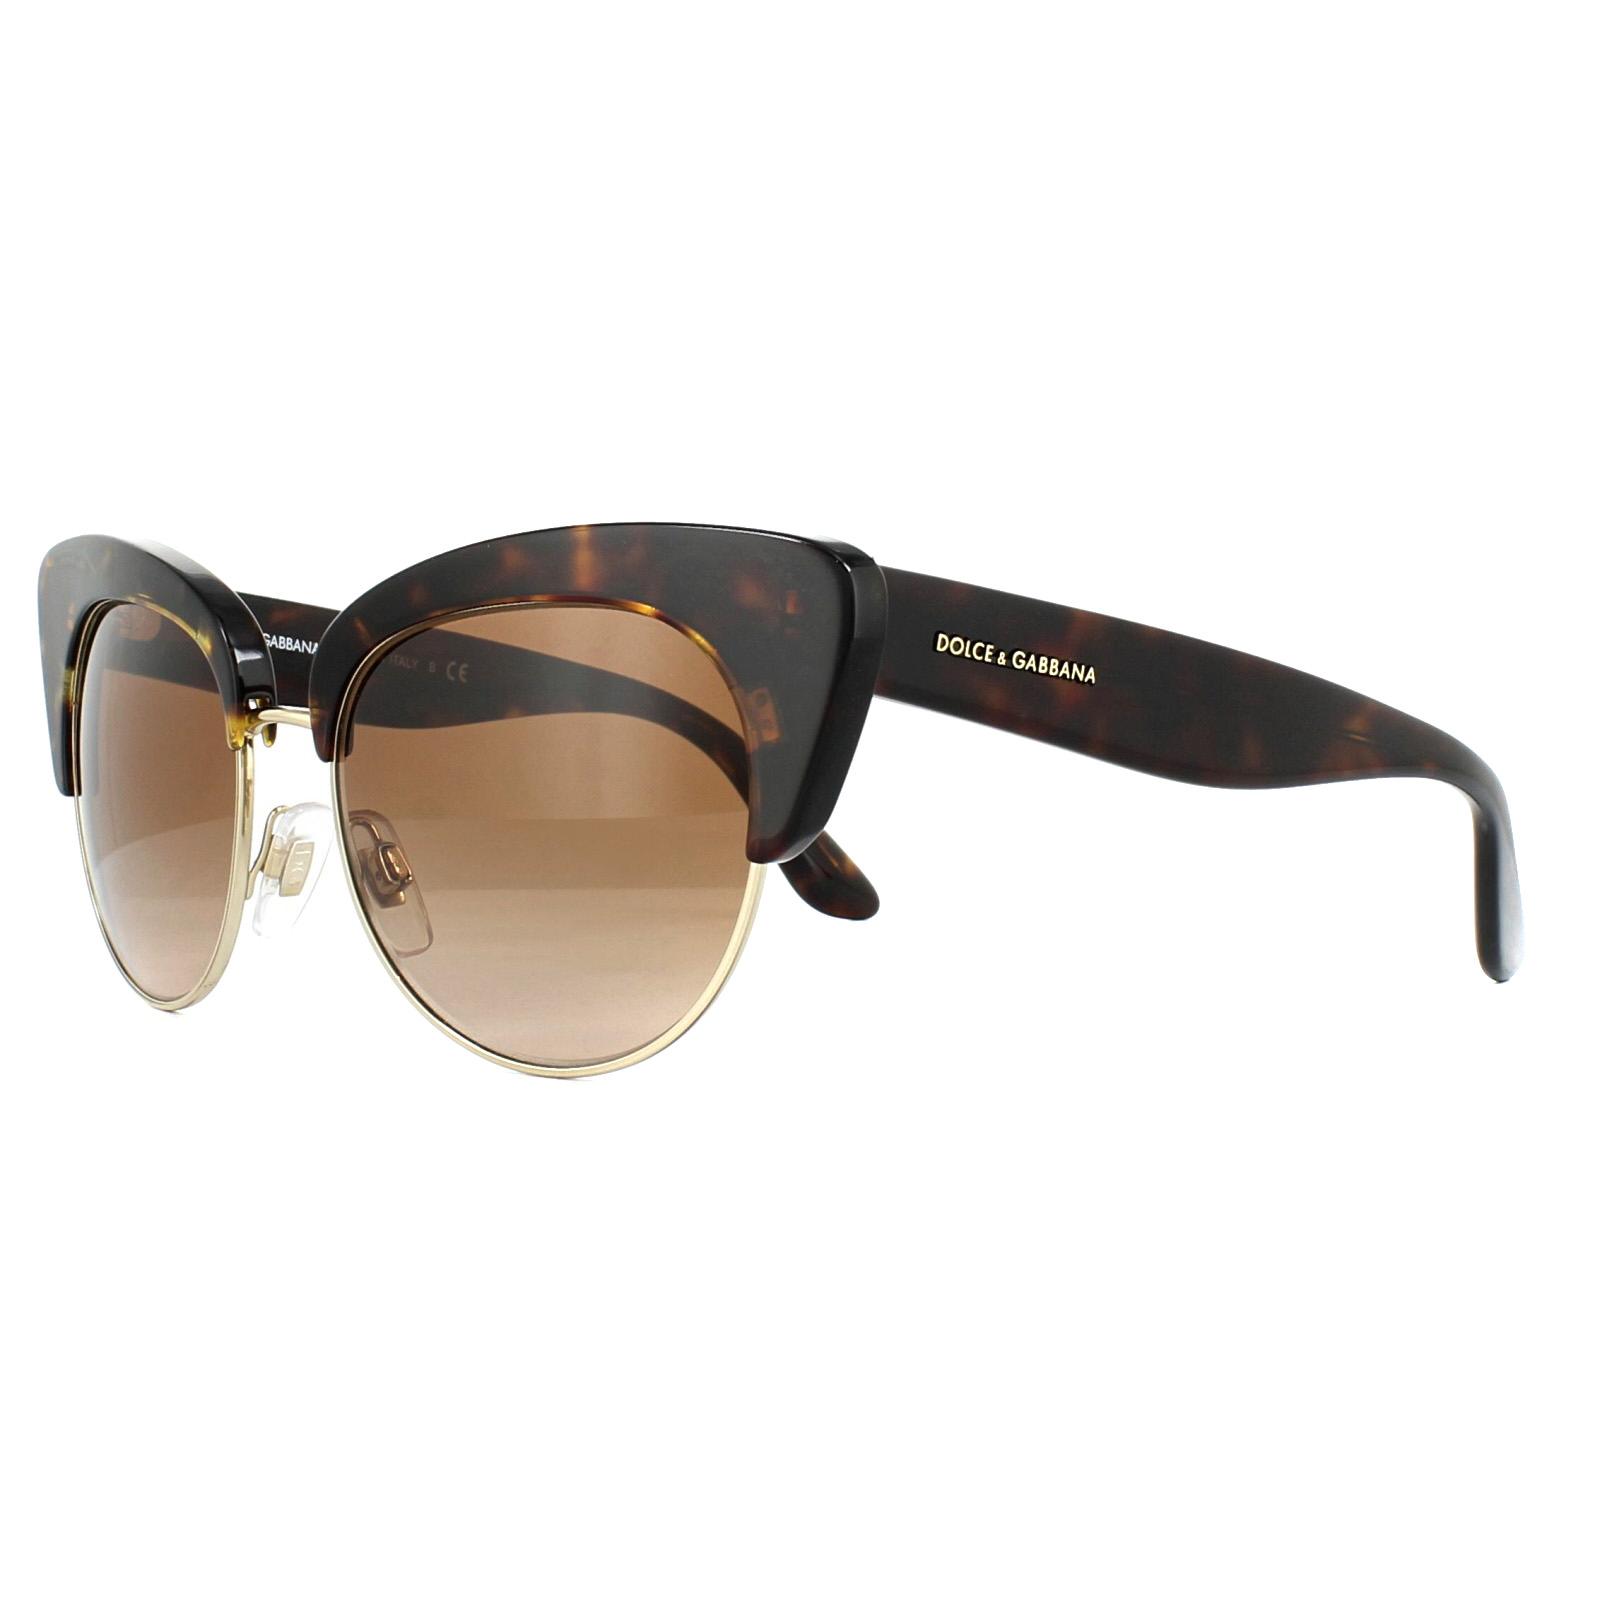 e3fc6434fcc3 Sentinel Dolce   Gabbana Sunglasses 4277 502-13 Havana and Gold Brown  Gradient